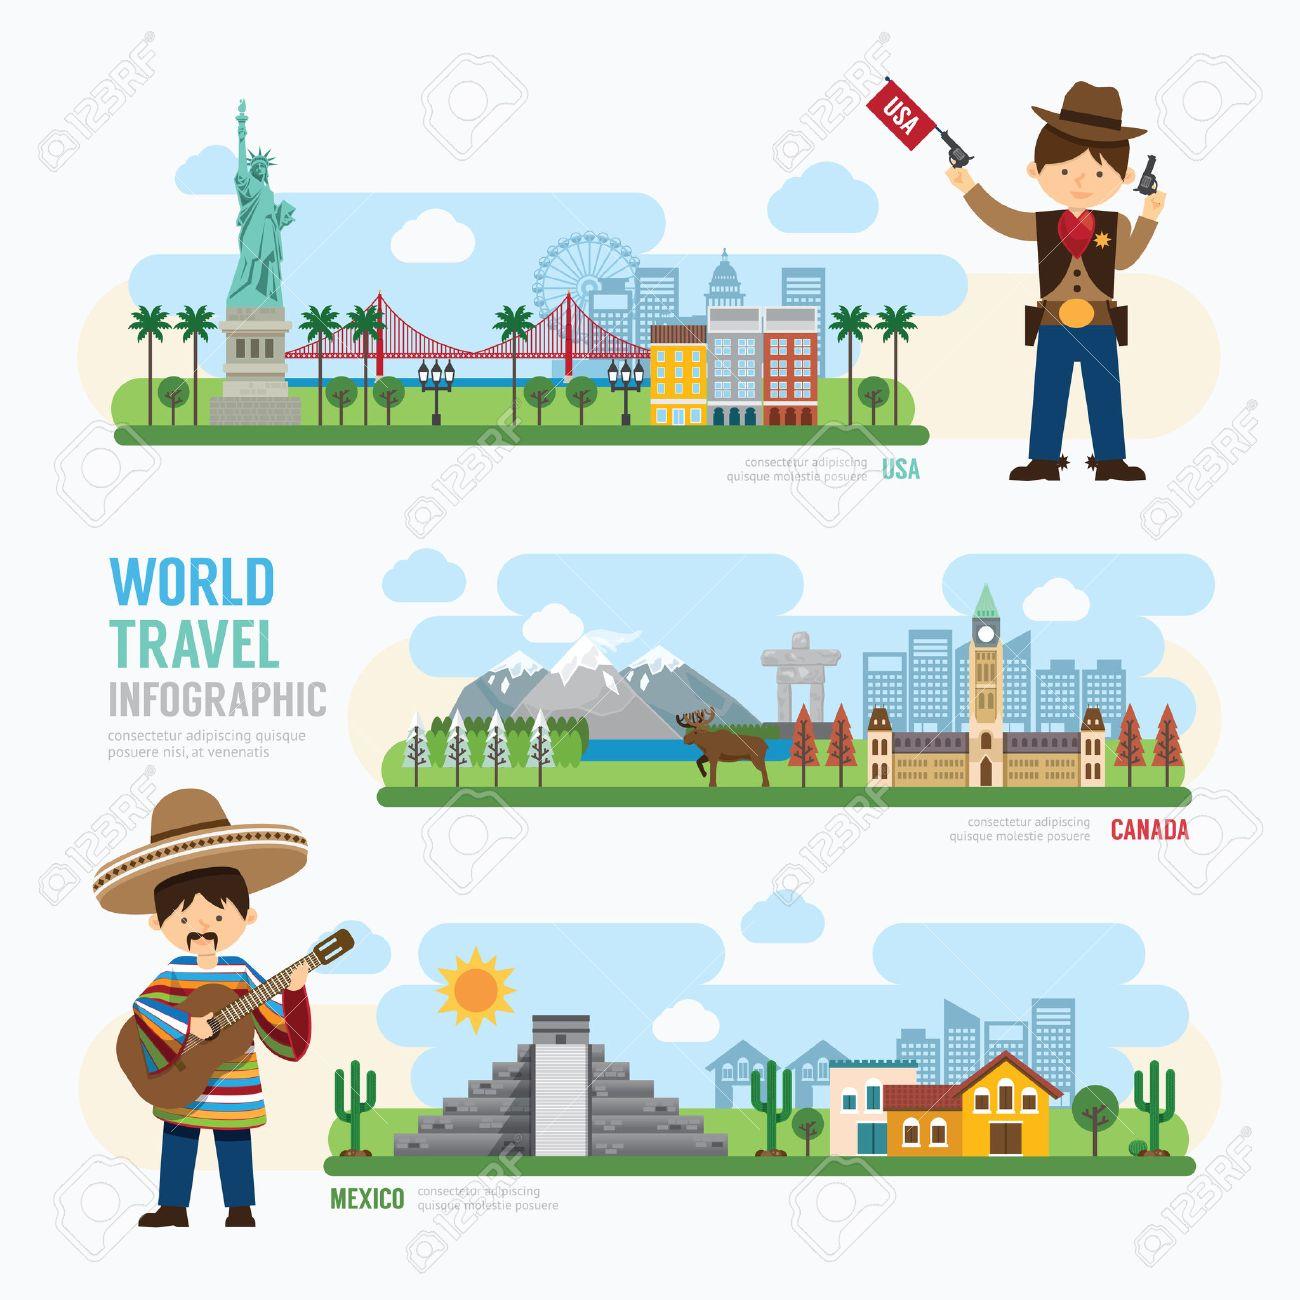 Travel and outdoor Landmark mexico, canada, usa Template Design Infographic. Concept Vector Illustration Standard-Bild - 42761457